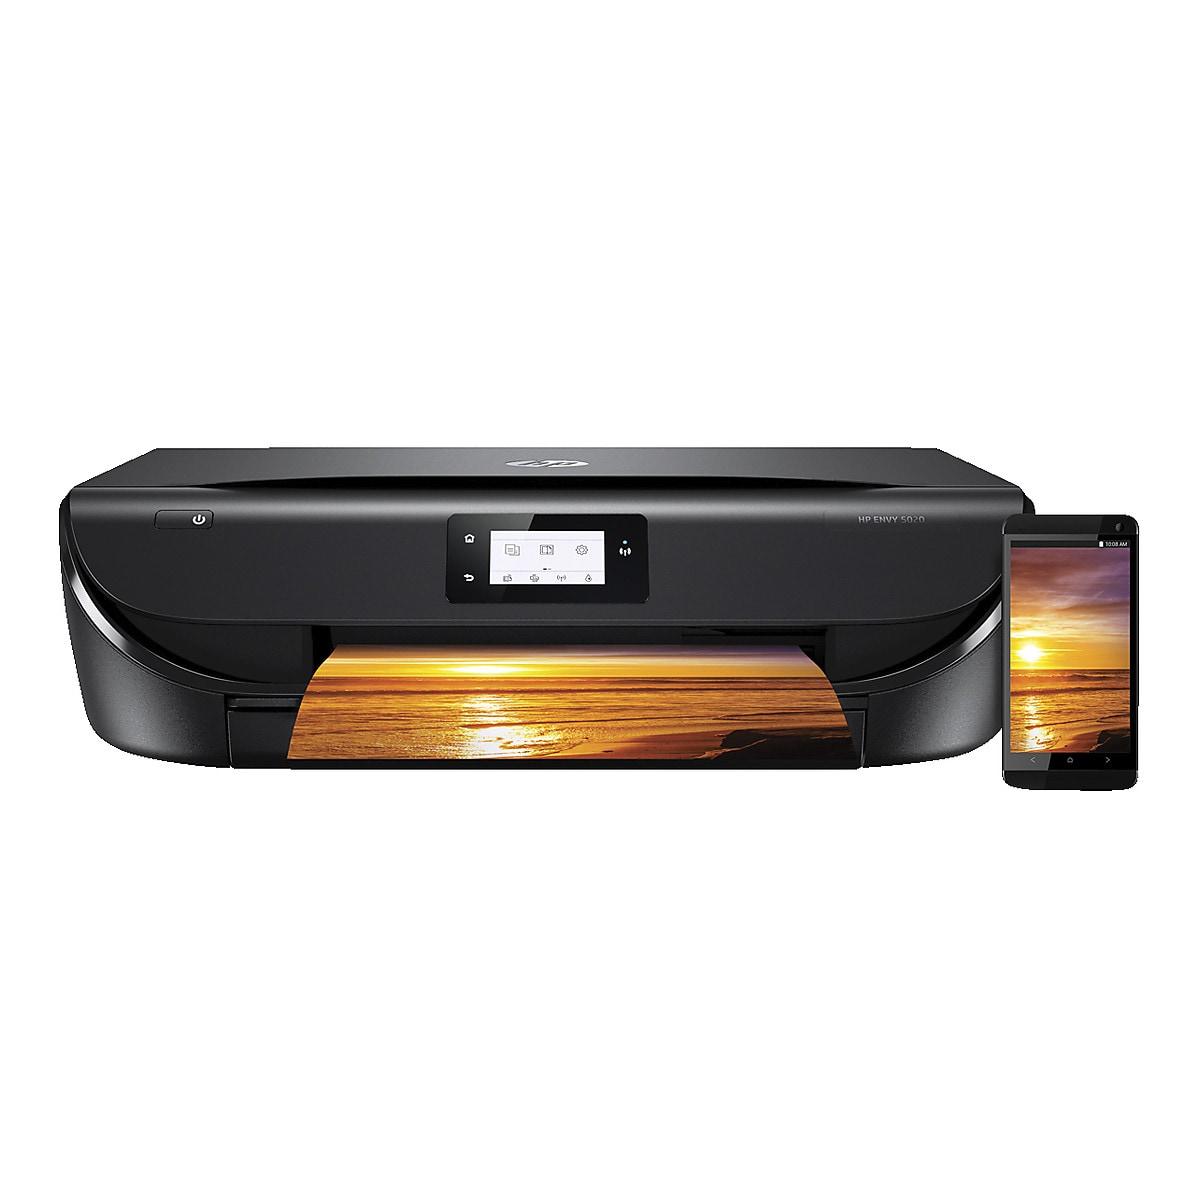 HP Envy 5020 AiO skrivare